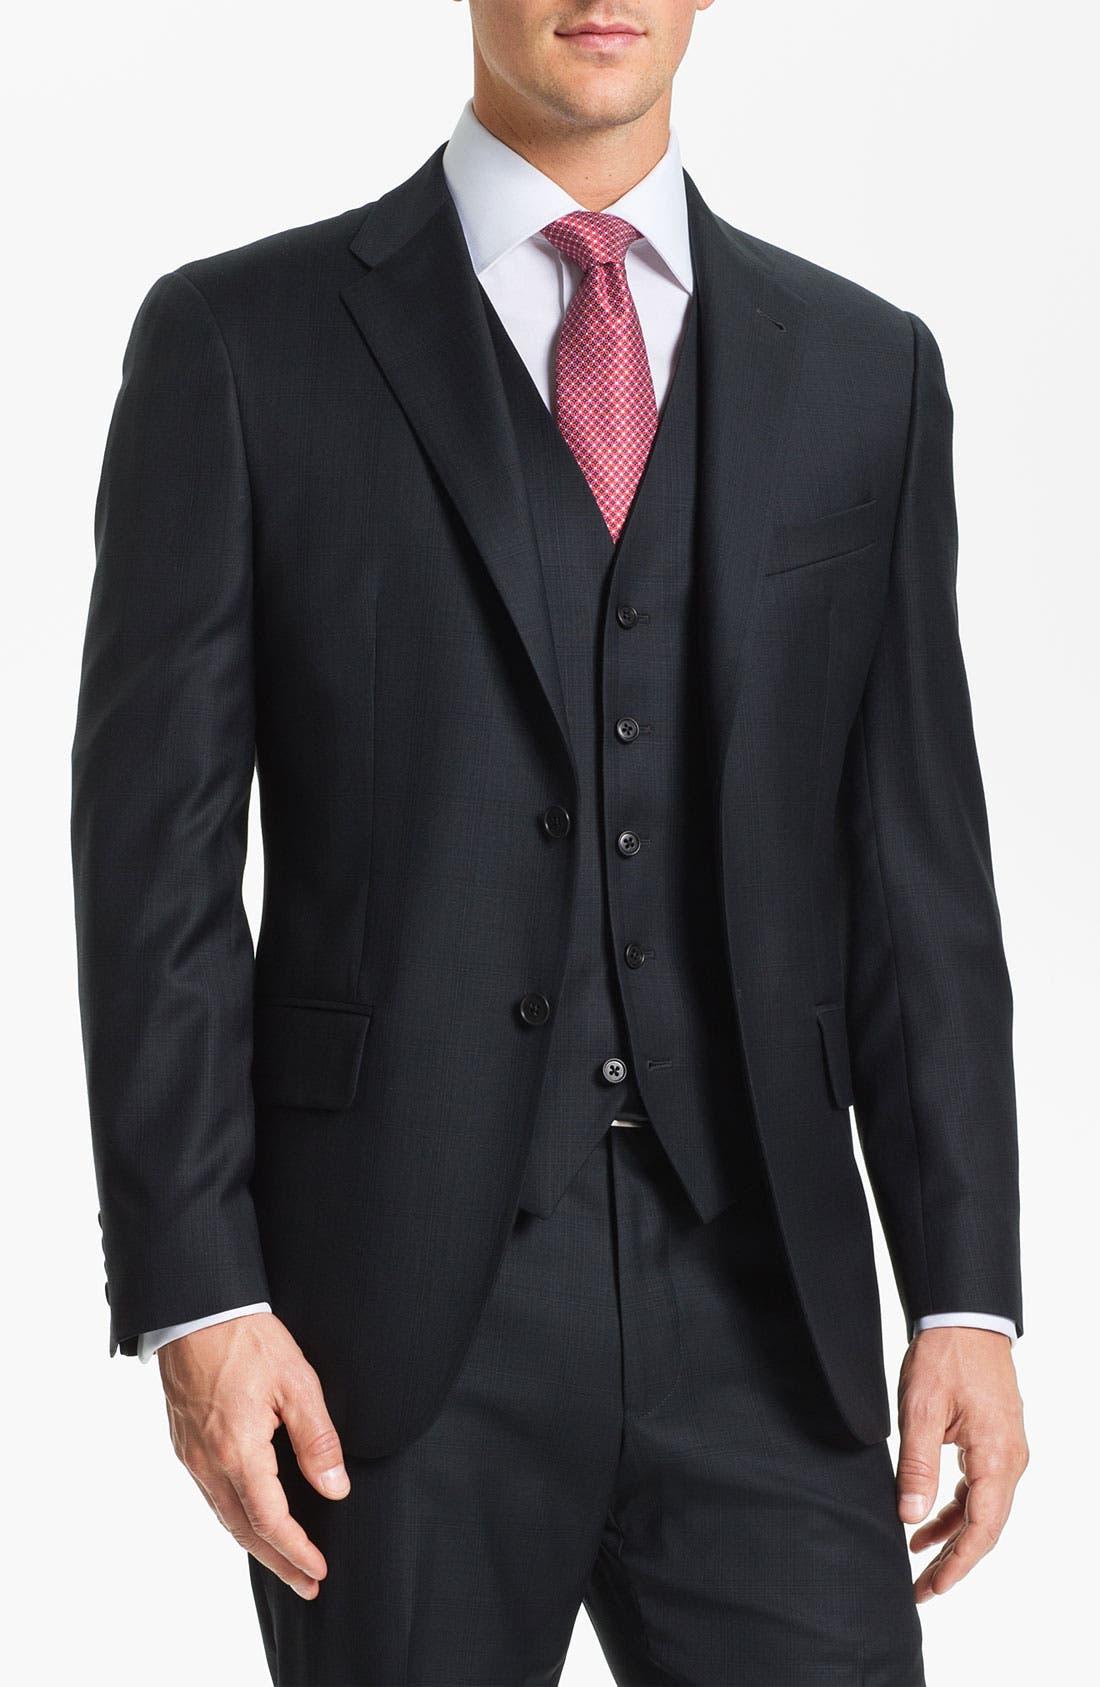 Alternate Image 1 Selected - Joseph Abboud Trim Fit Three Piece Suit